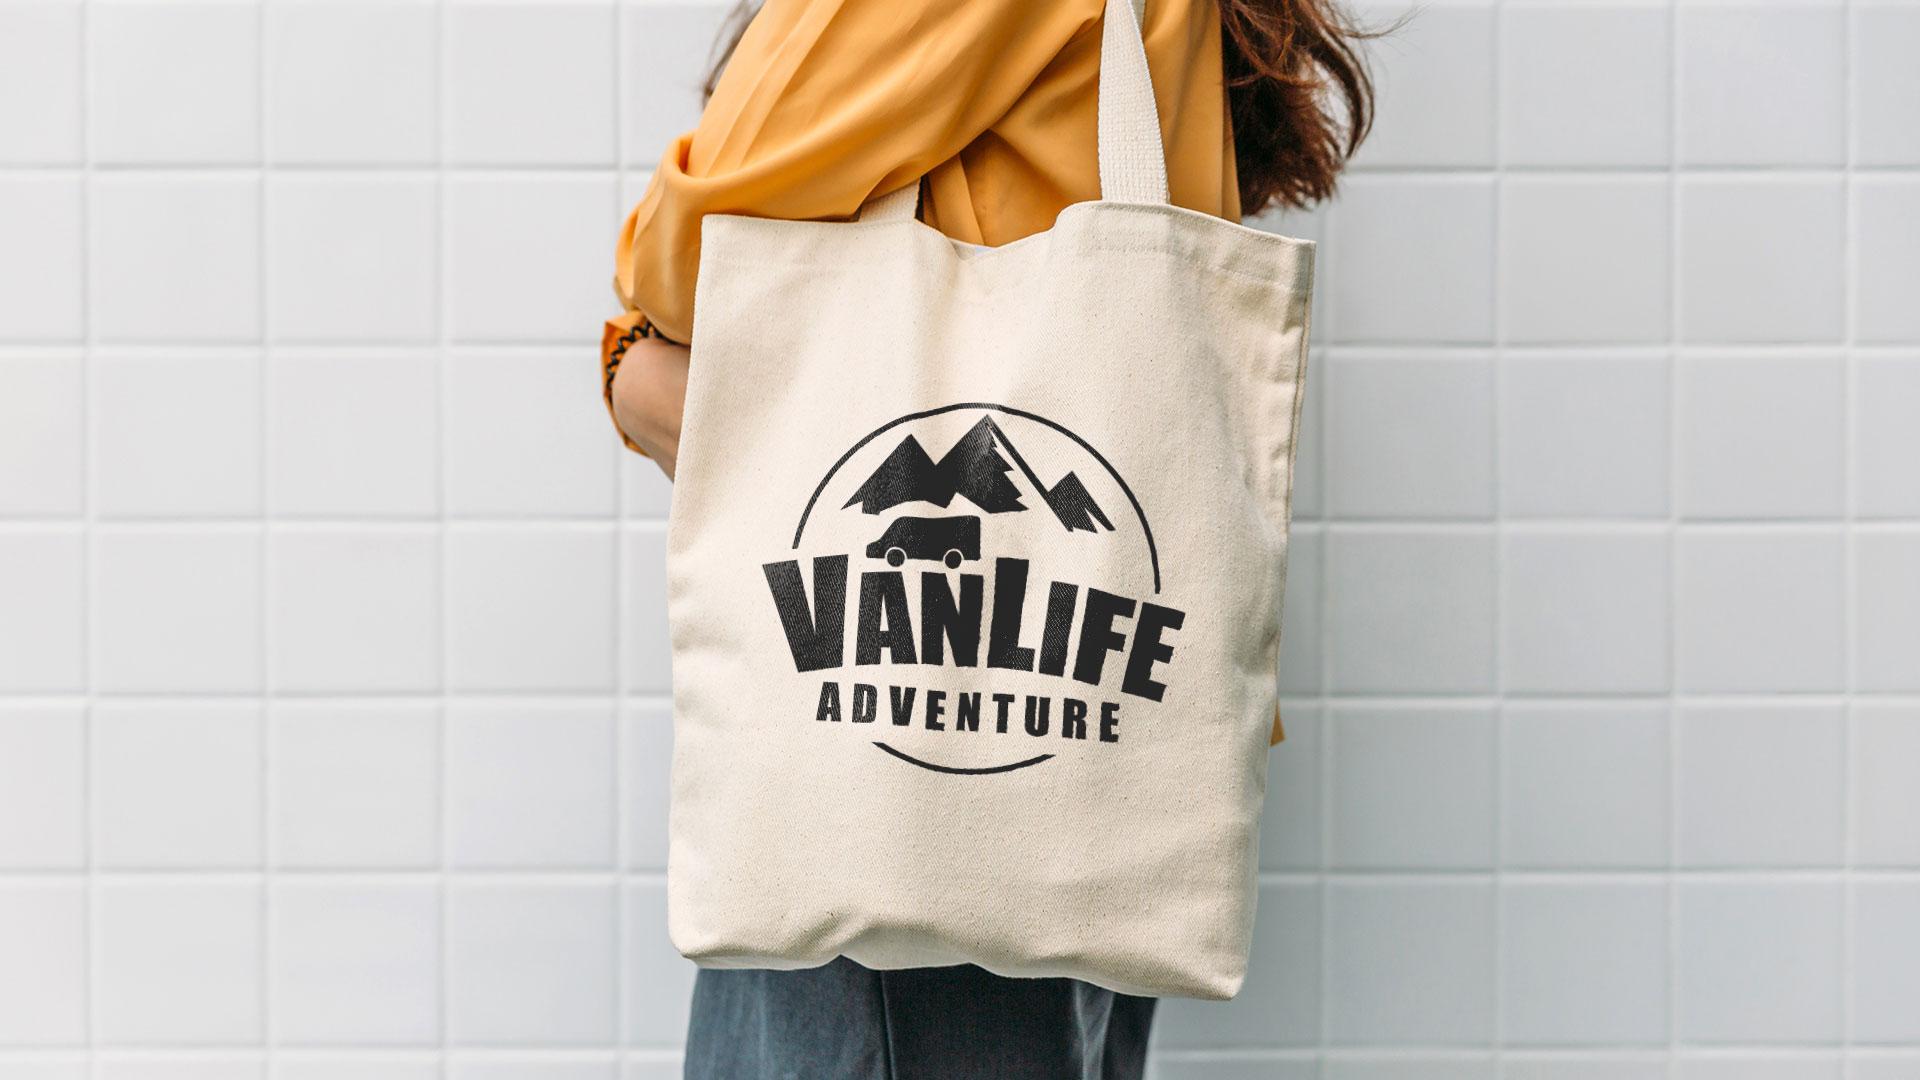 woman holding a VanLife tote bag eco-friendly campervan